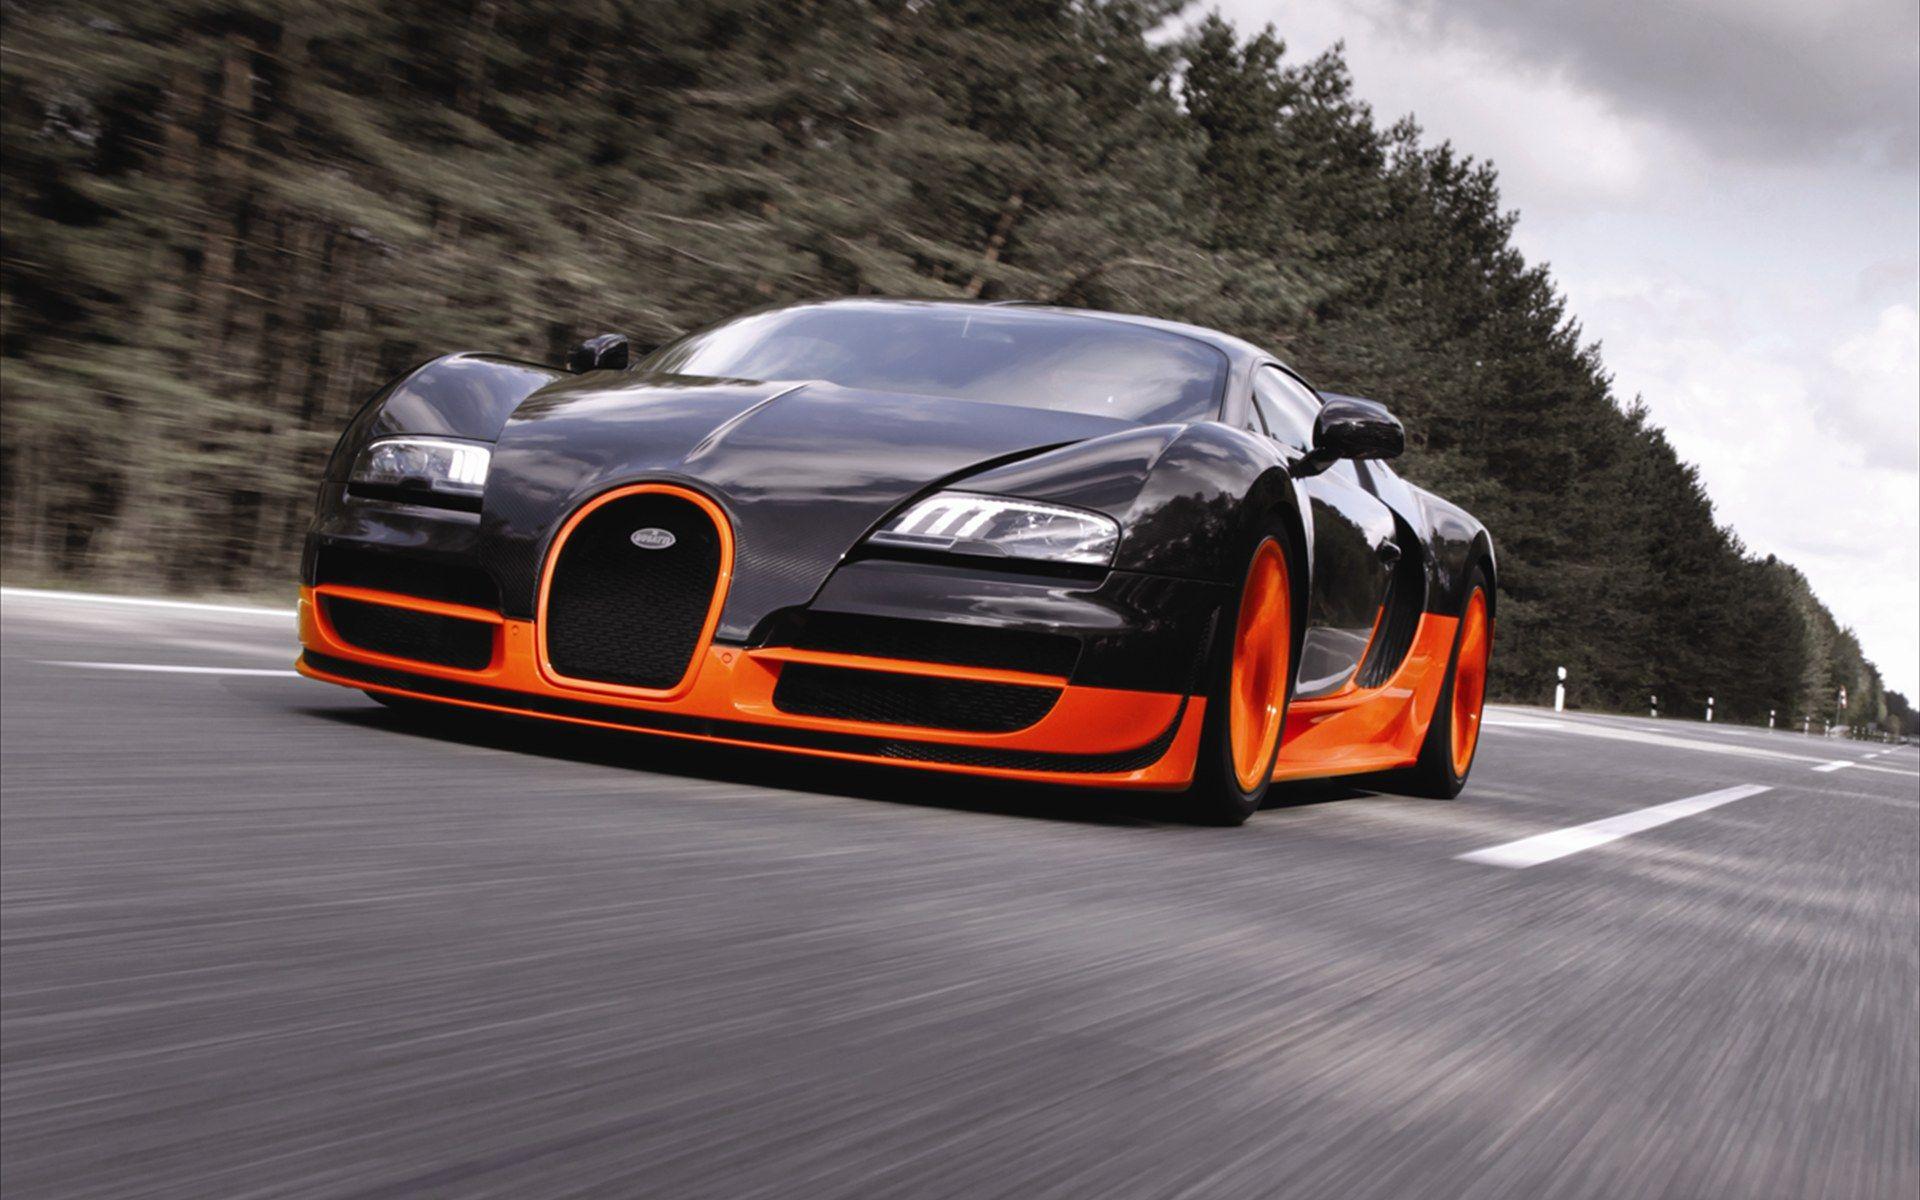 The Bugatti Veyron Still The World S Fastest Car With New Launced 2011 Bugatti Veyron 16 4 Super Sp With Images Bugatti Veyron Super Sport Bugatti Cars Bugatti Super Sport